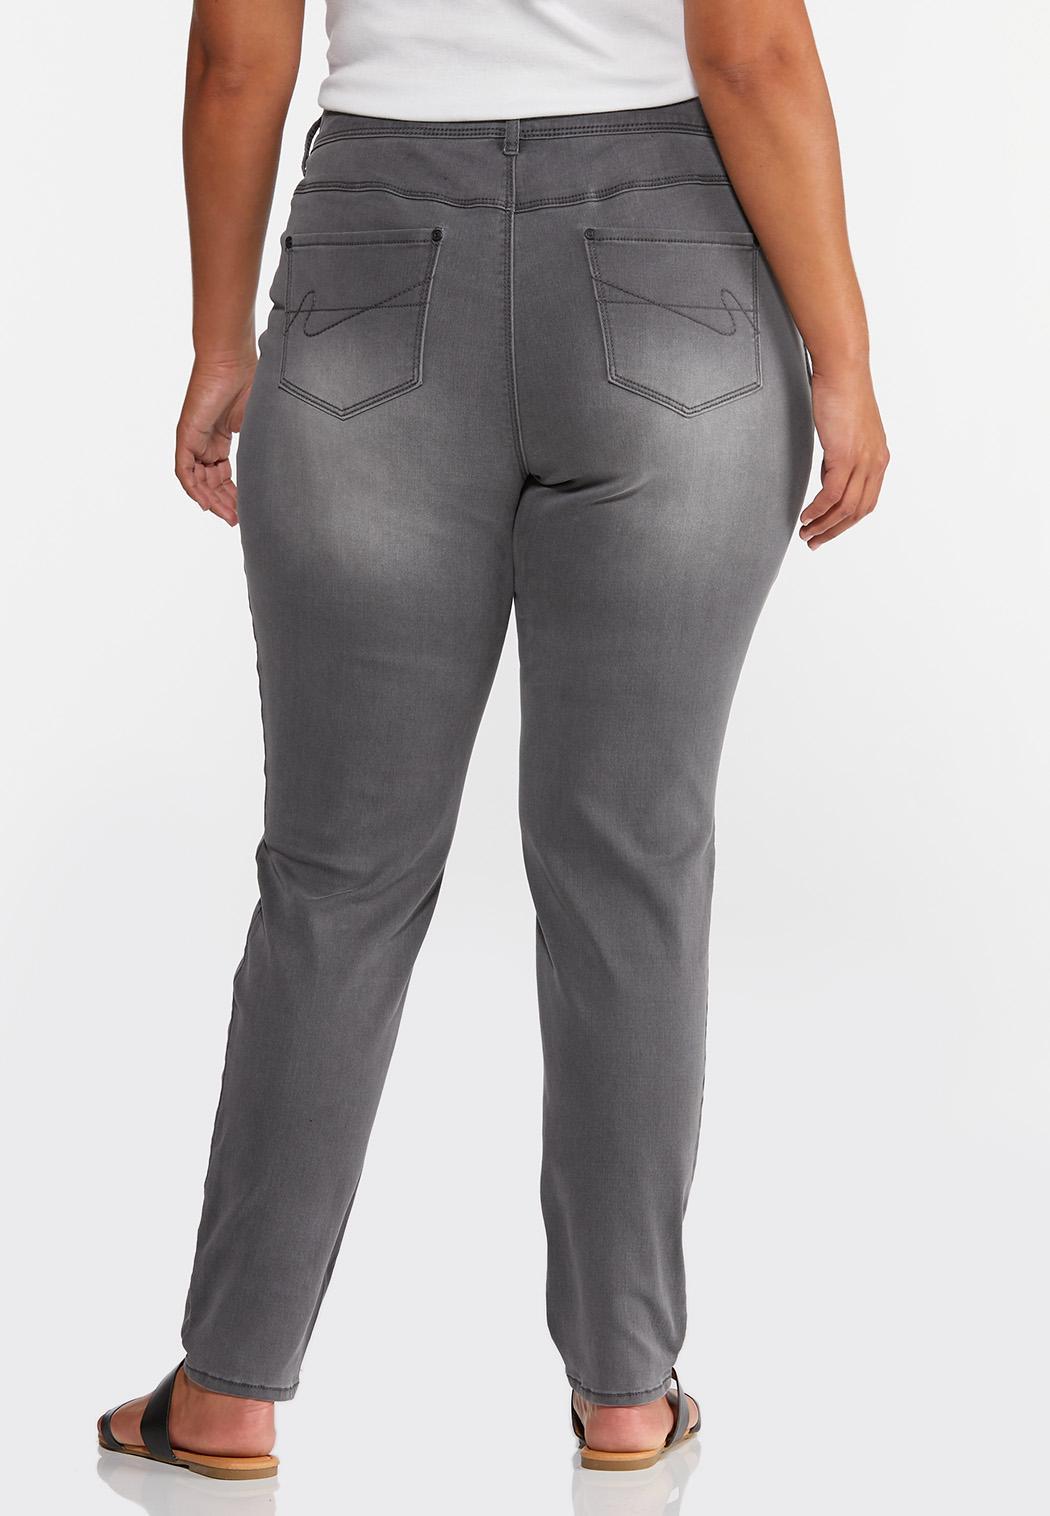 Plus Size Gray Jeggings (Item #44378400)